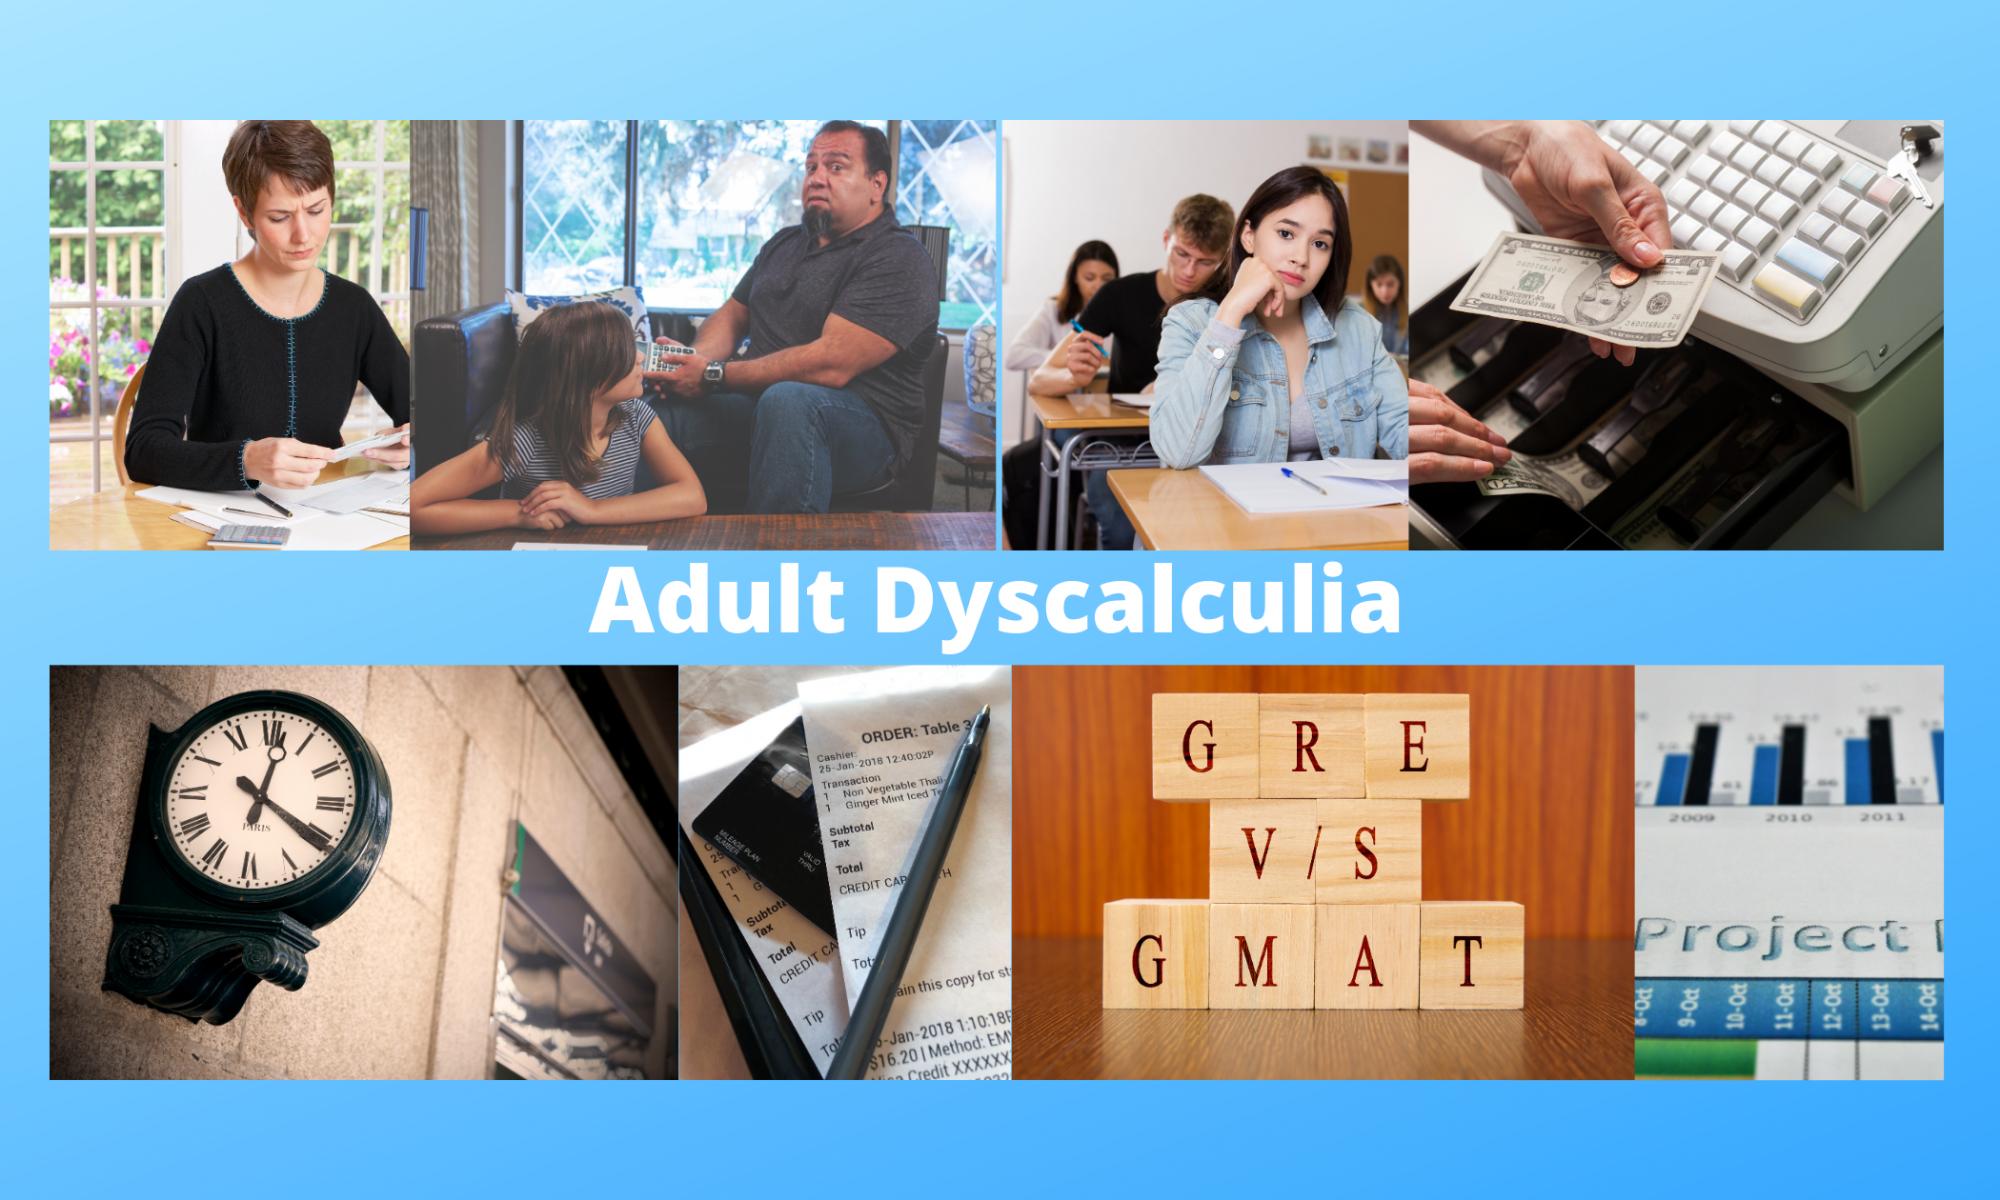 Adult Dyscalculia